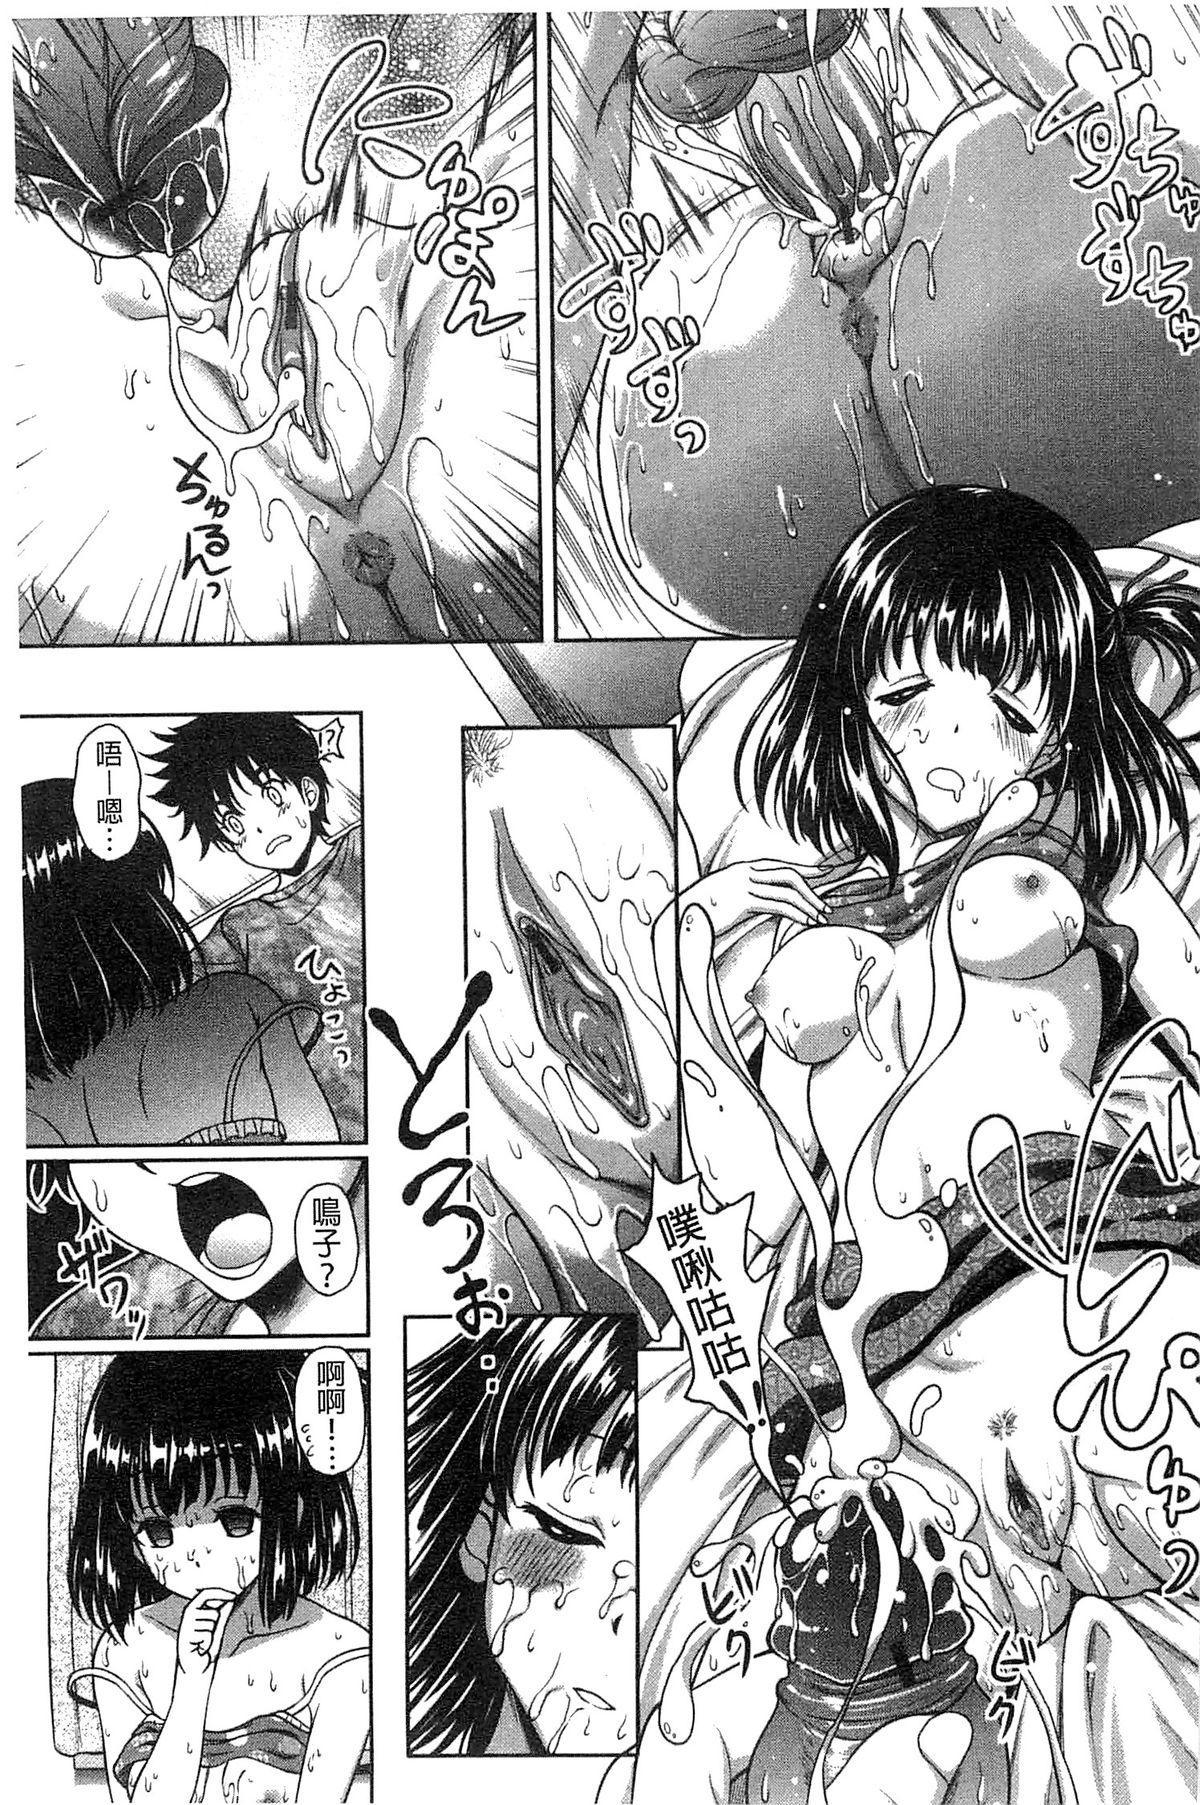 Hajimete nan dakara - First sexual experience 89